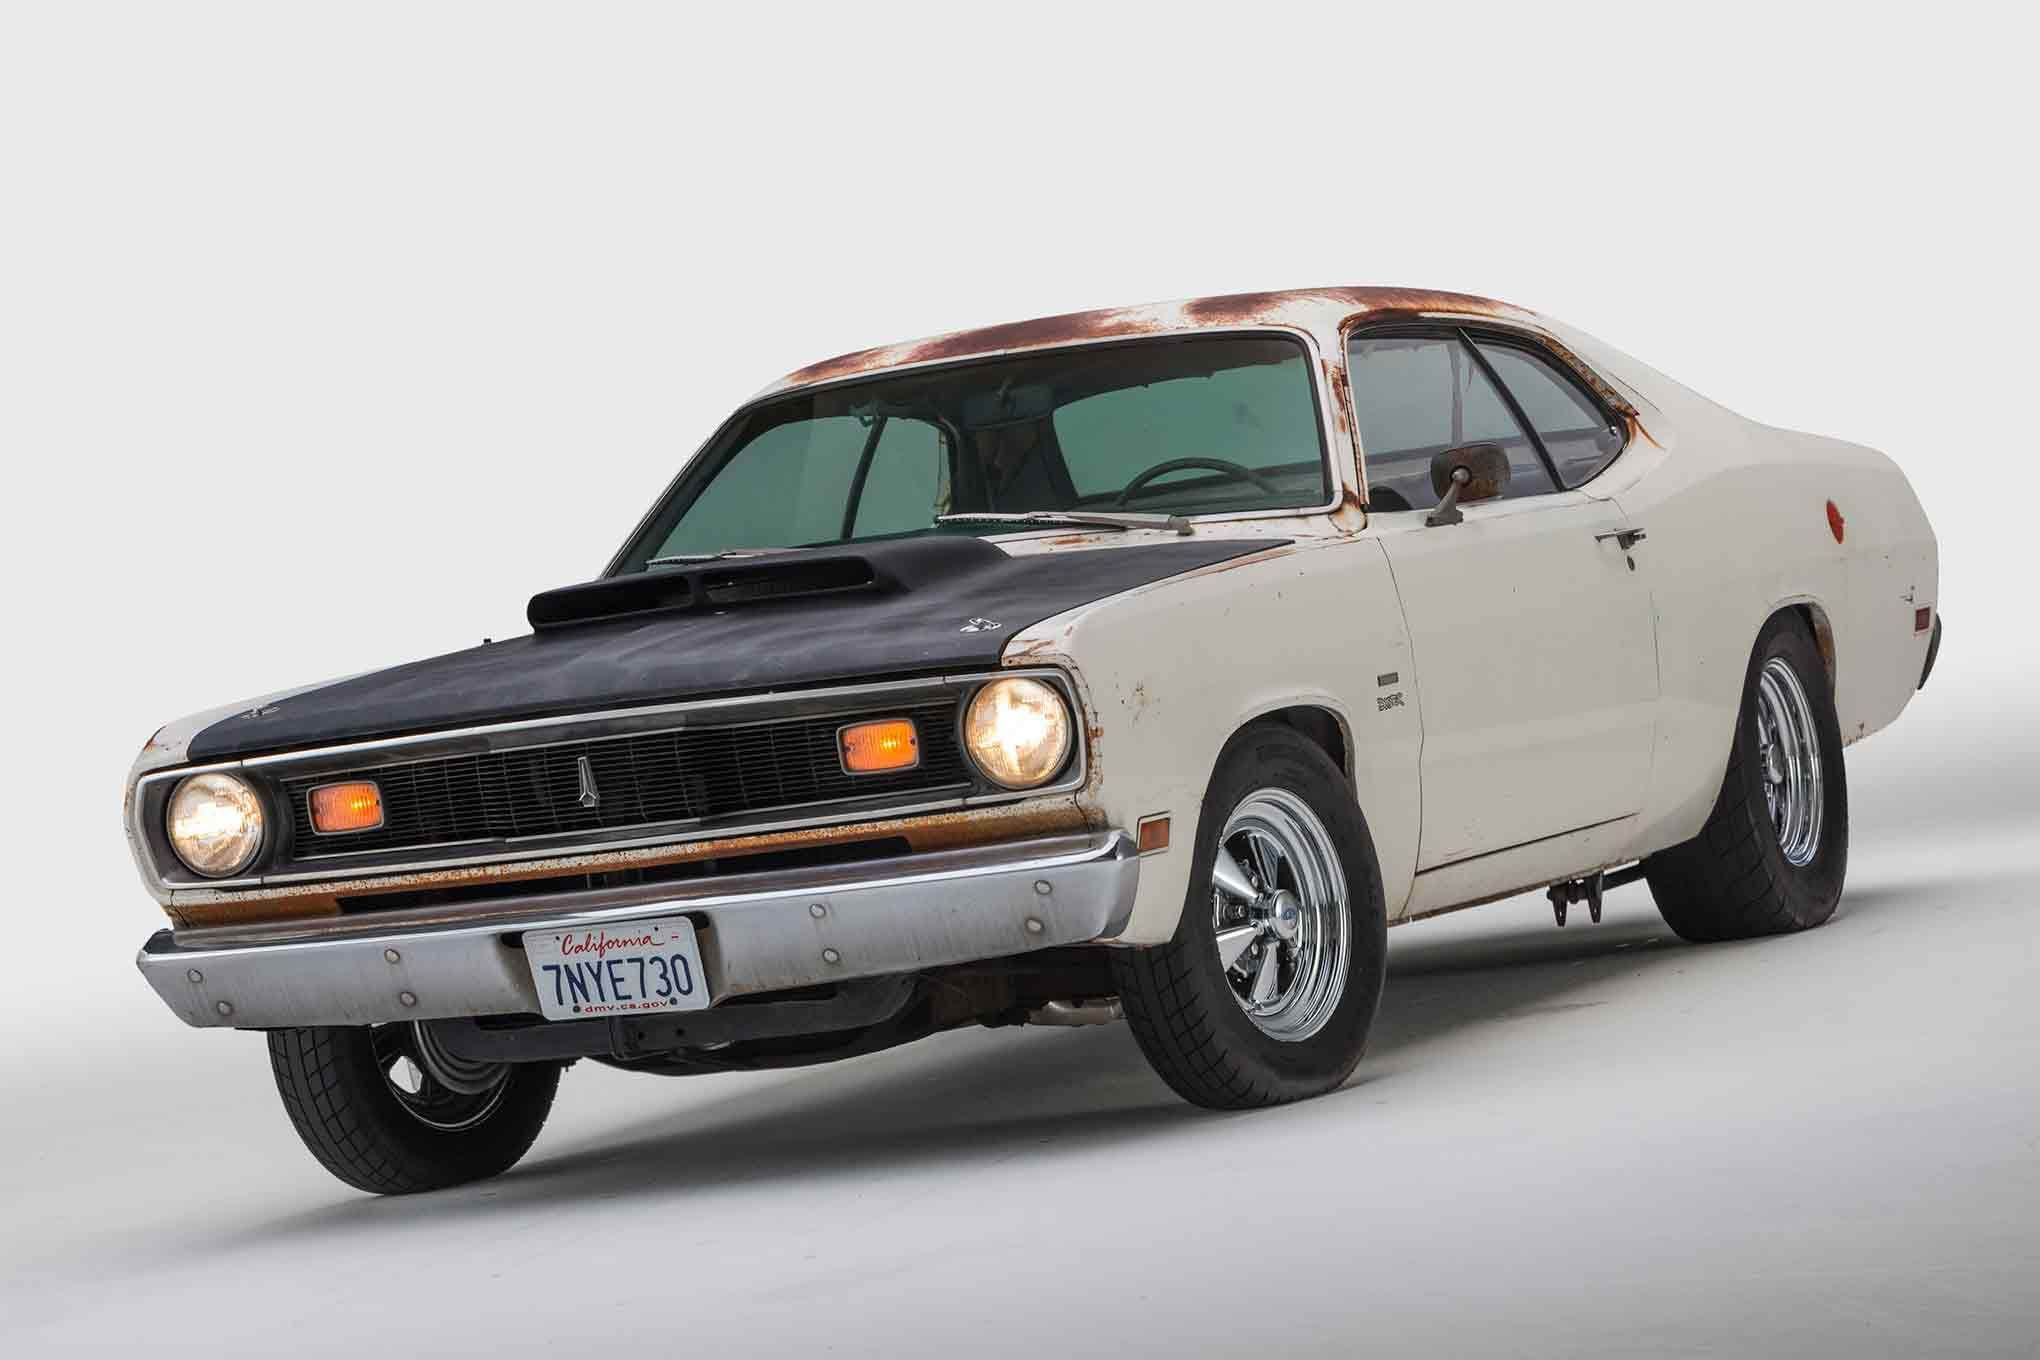 RoadKill 1970 Plymouth Duster